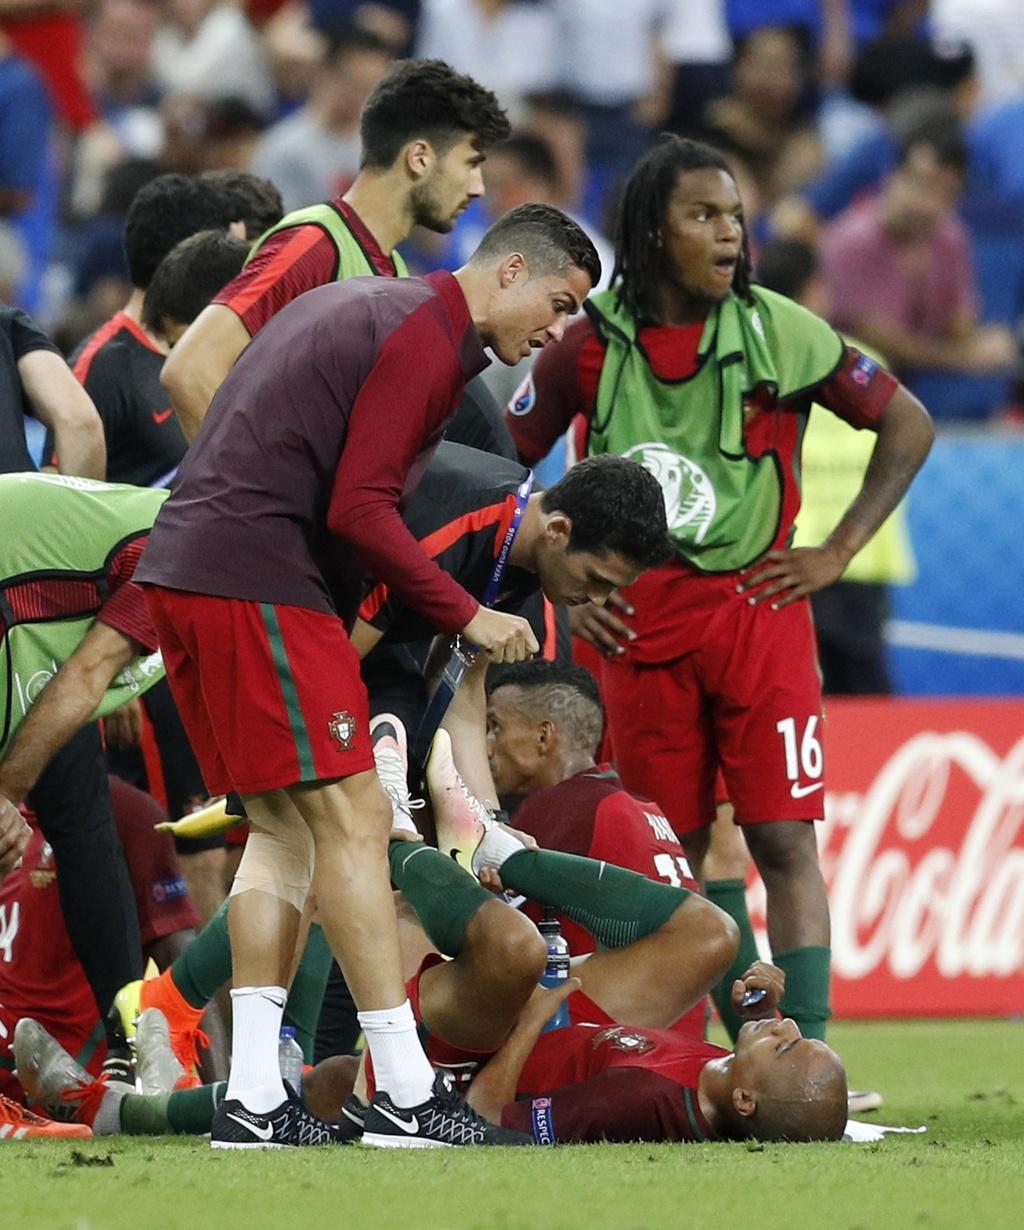 Ronaldo hon dau Nani, ho het chi dao va tiep lua dong doi hinh anh 5